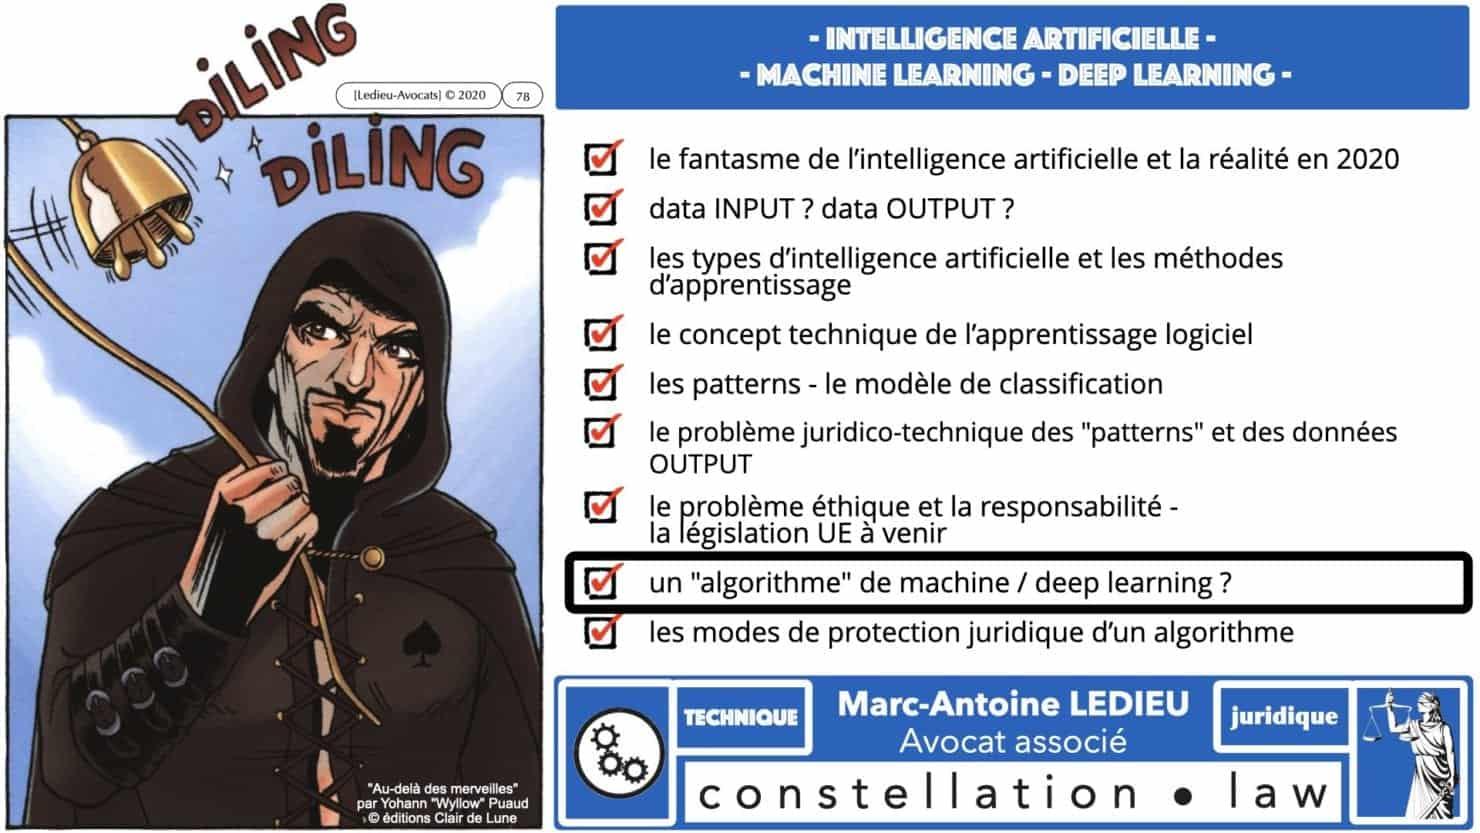 307 Intelligence artificielle-machine-learning-deep-learning-base de données-BIG-DATA *16:9* Constellation ©Ledieu-Avocat-13-10-2020.078